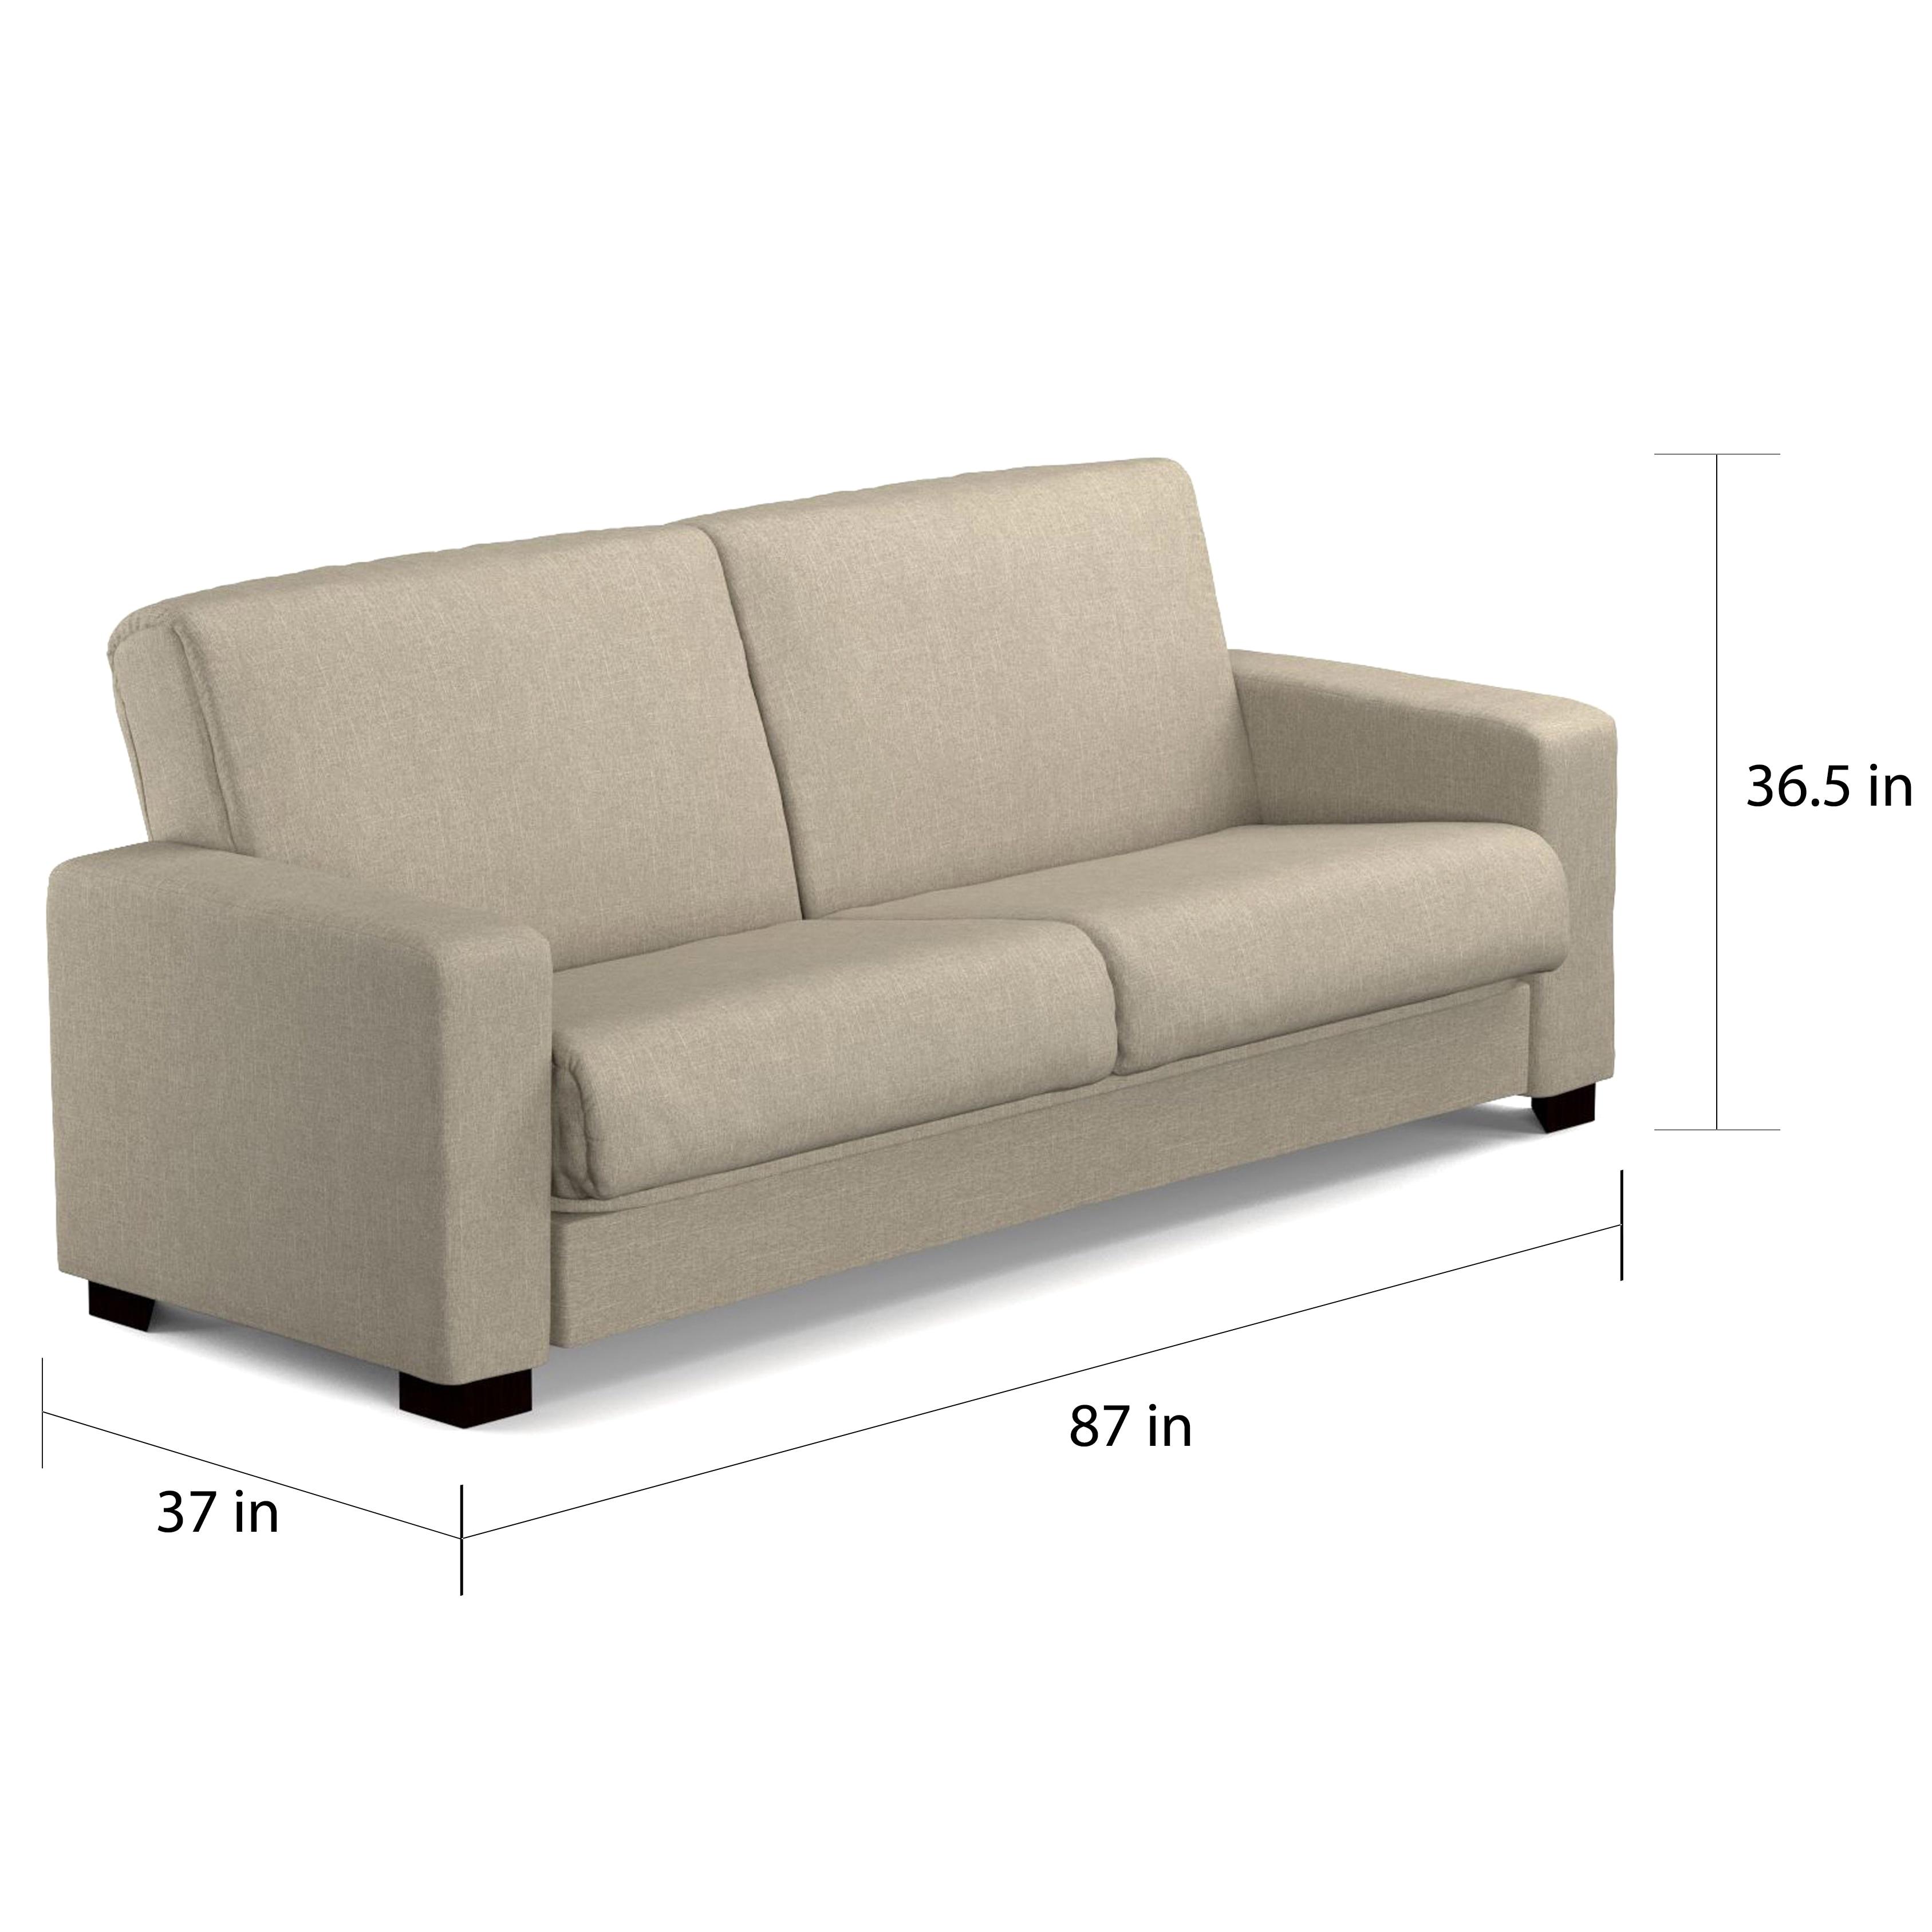 Shop Handy Living Tempo Convert A Couch Barley Tan Linen Futon Sleeper Sofa    Free Shipping Today   Overstock.com   11469622